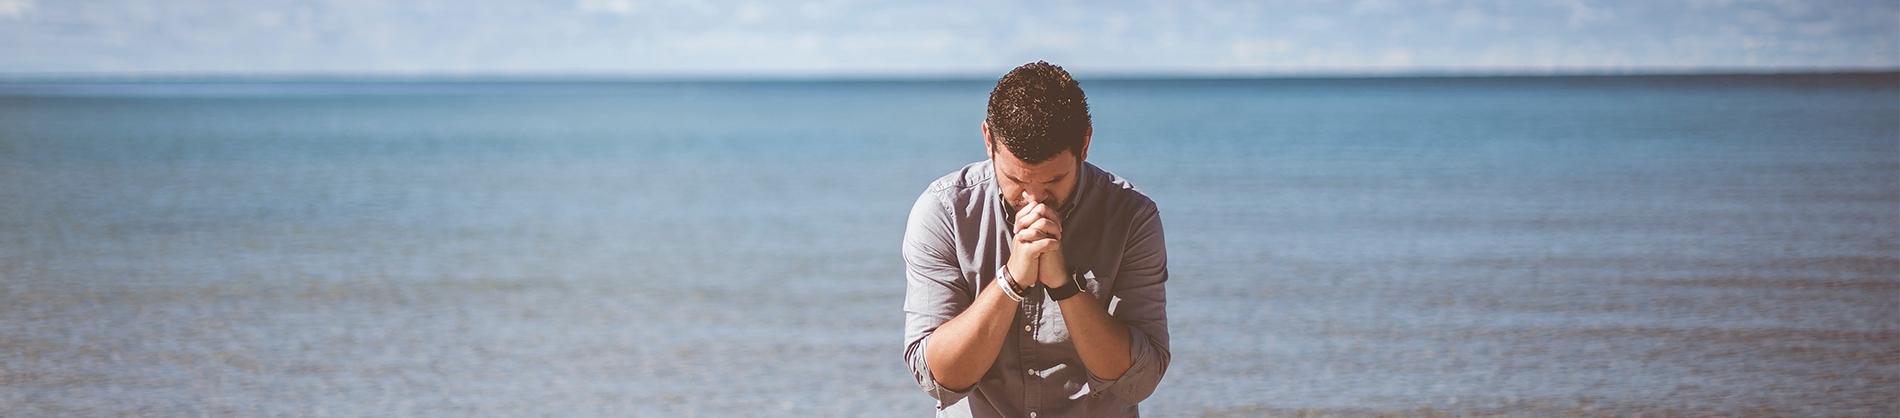 A man kneeling on a beach in prayer